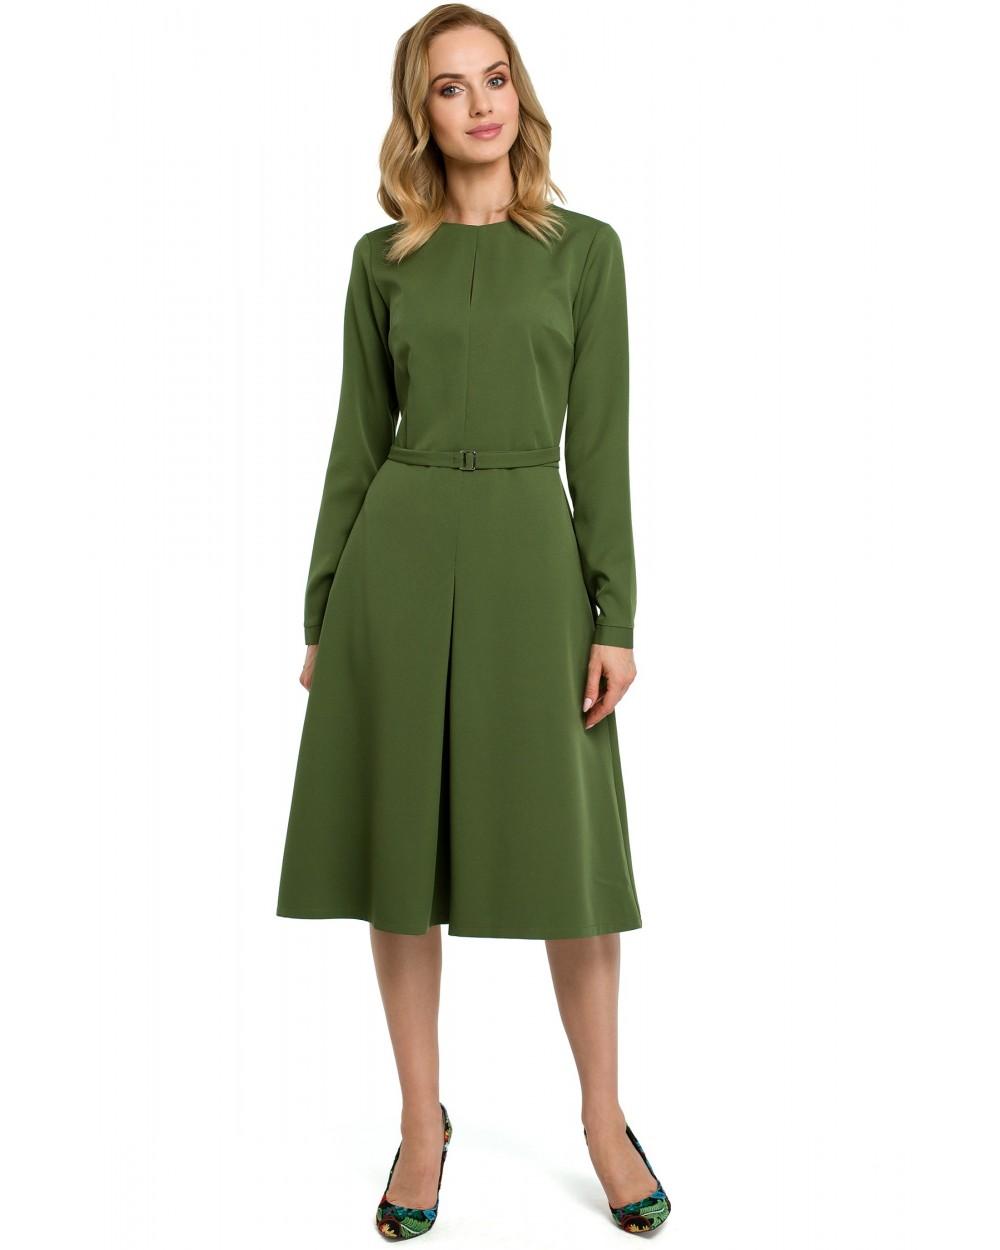 e11930cca3 Sukienka damska klasyczna elegancka zielona do pracy sklep online